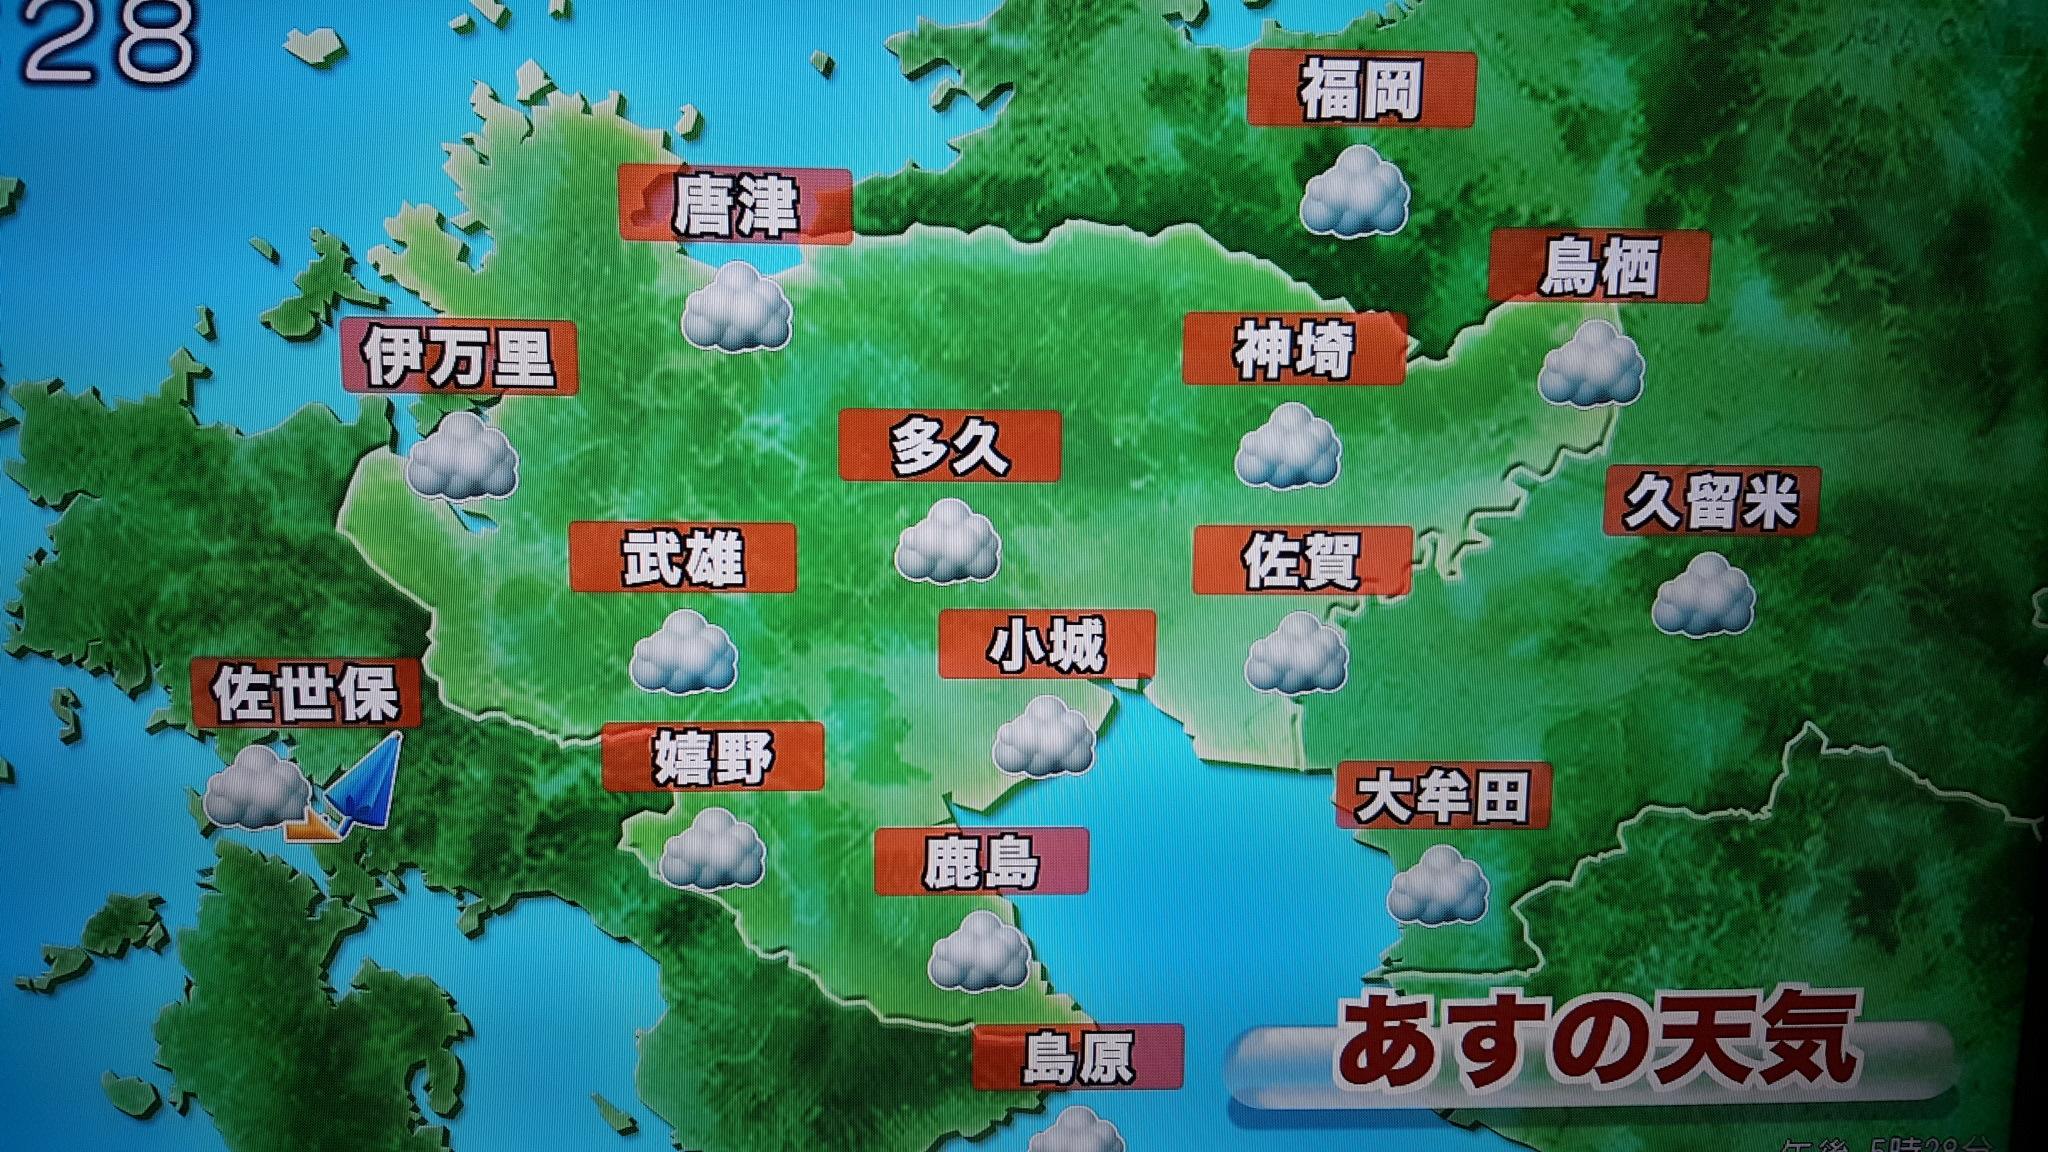 伊万里 明日 の 天気